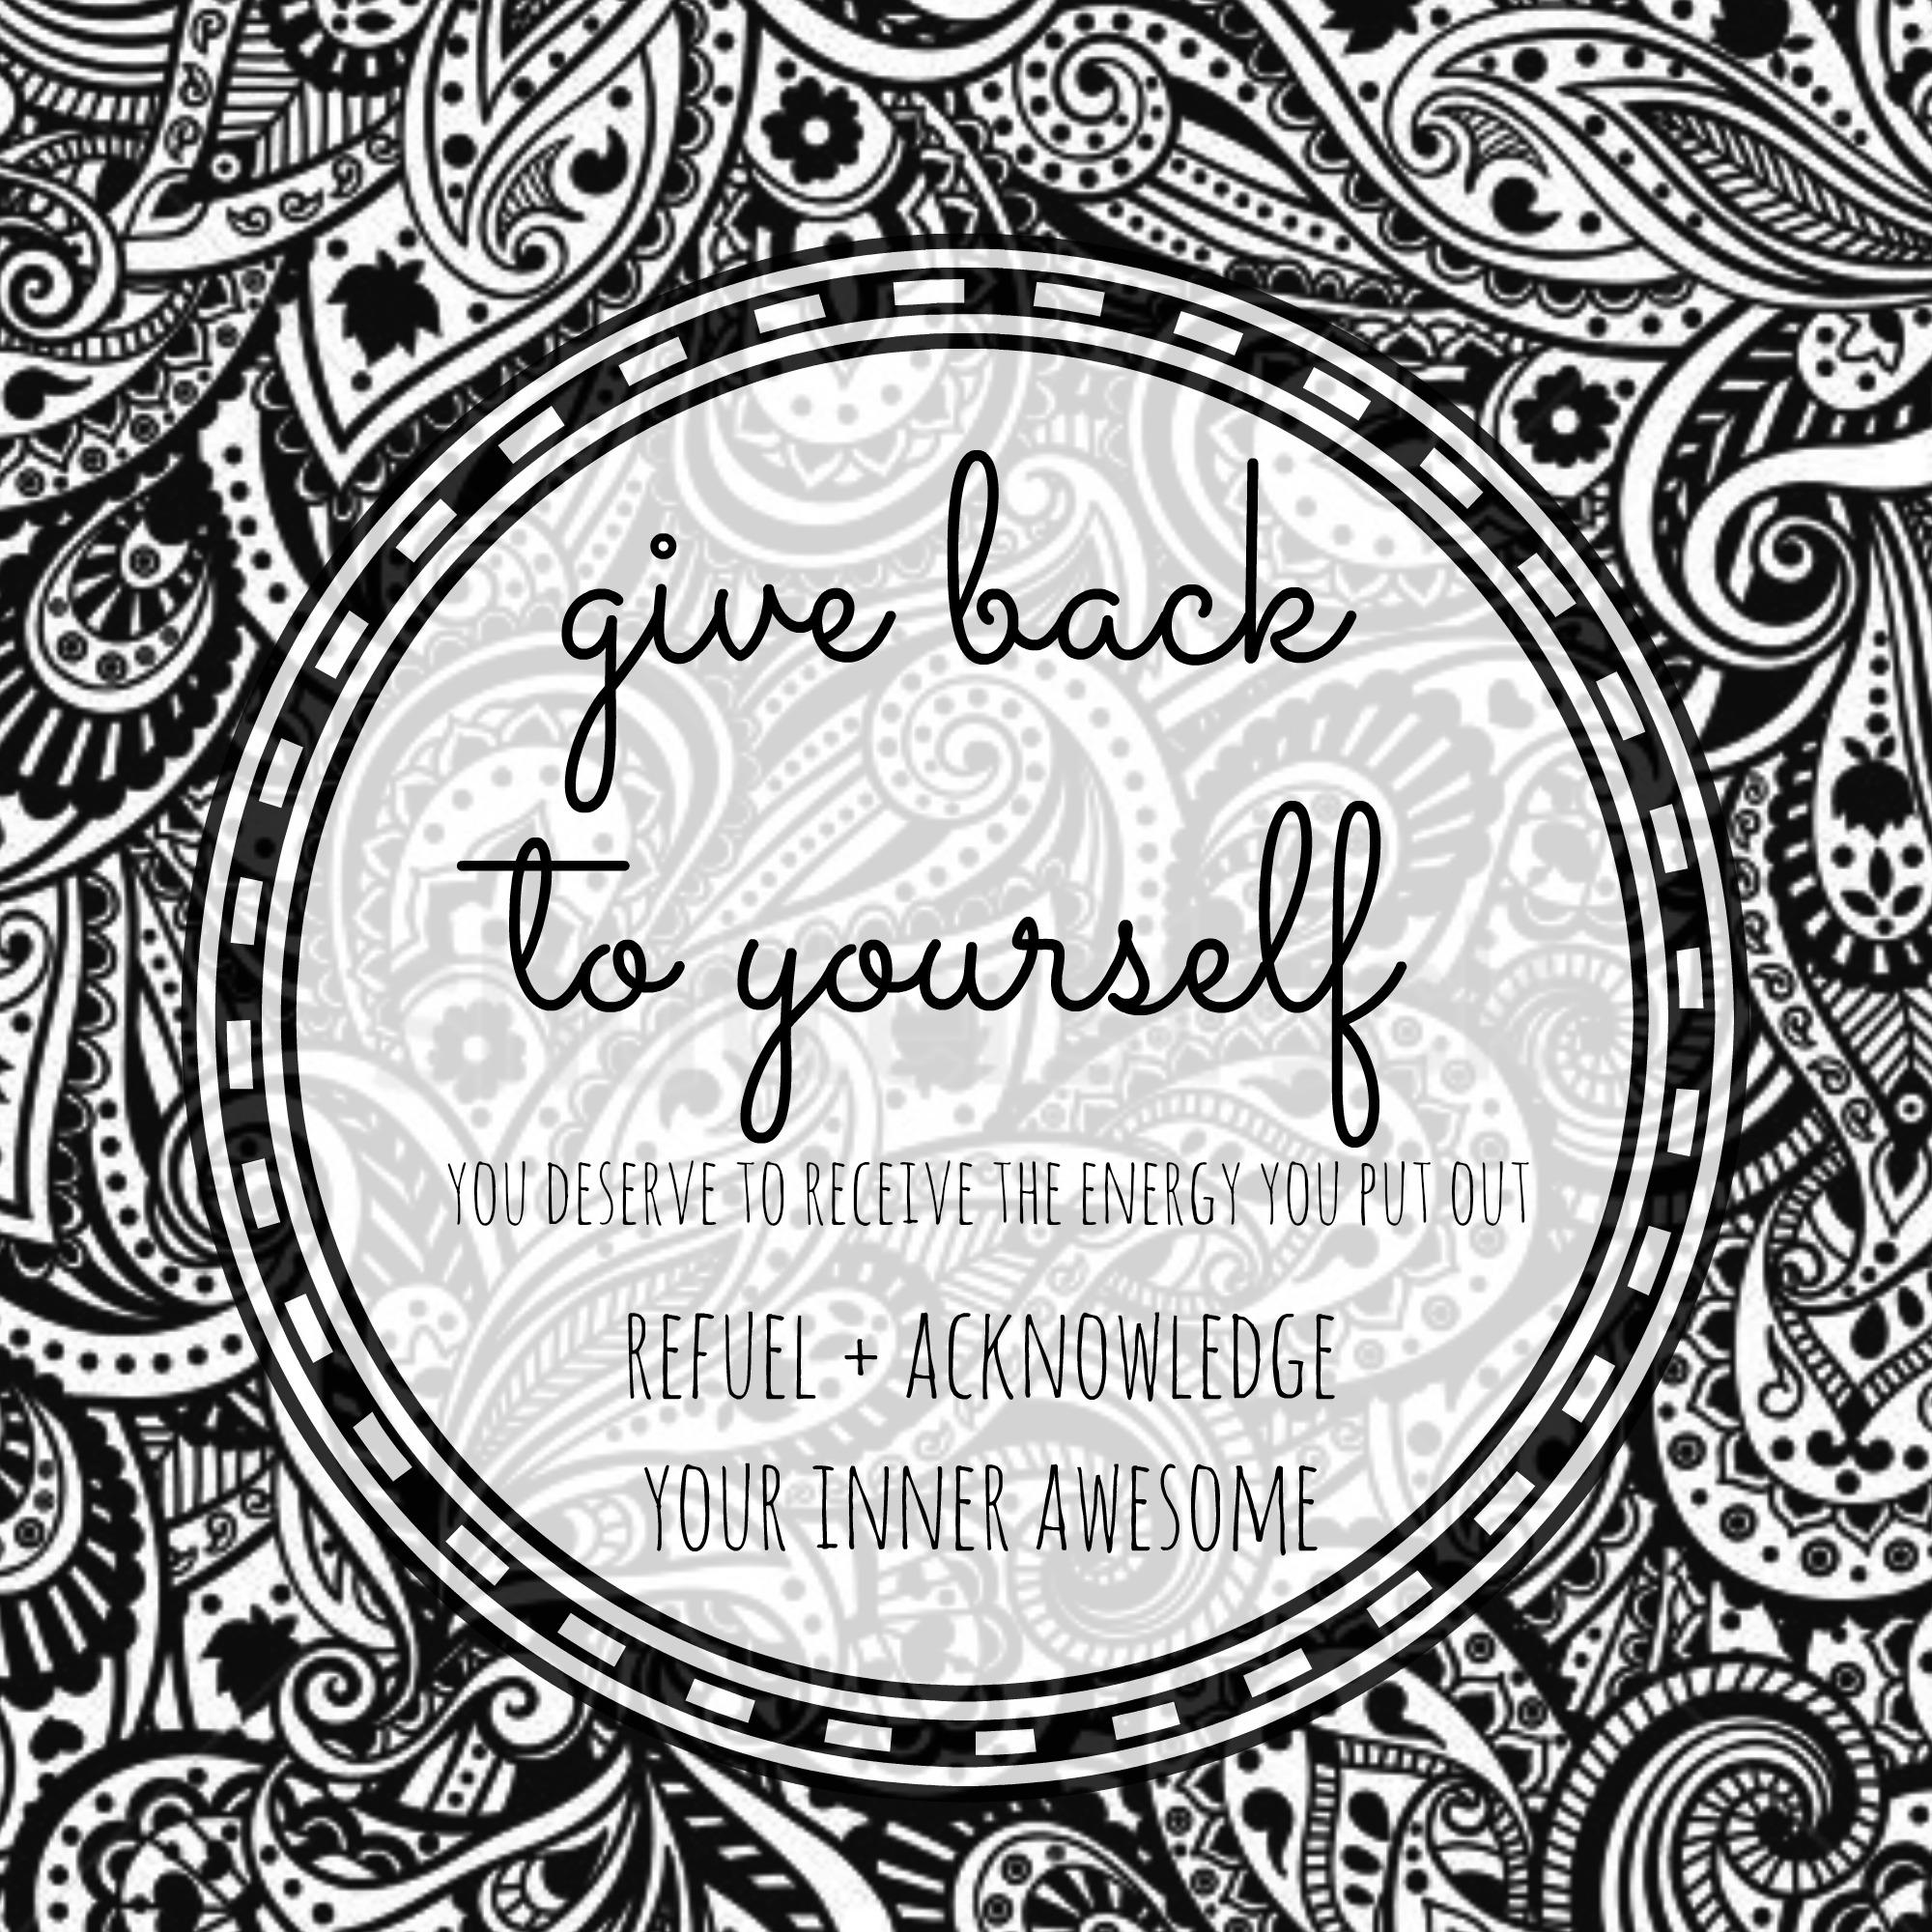 Change YES! - Self-love3 .jpg